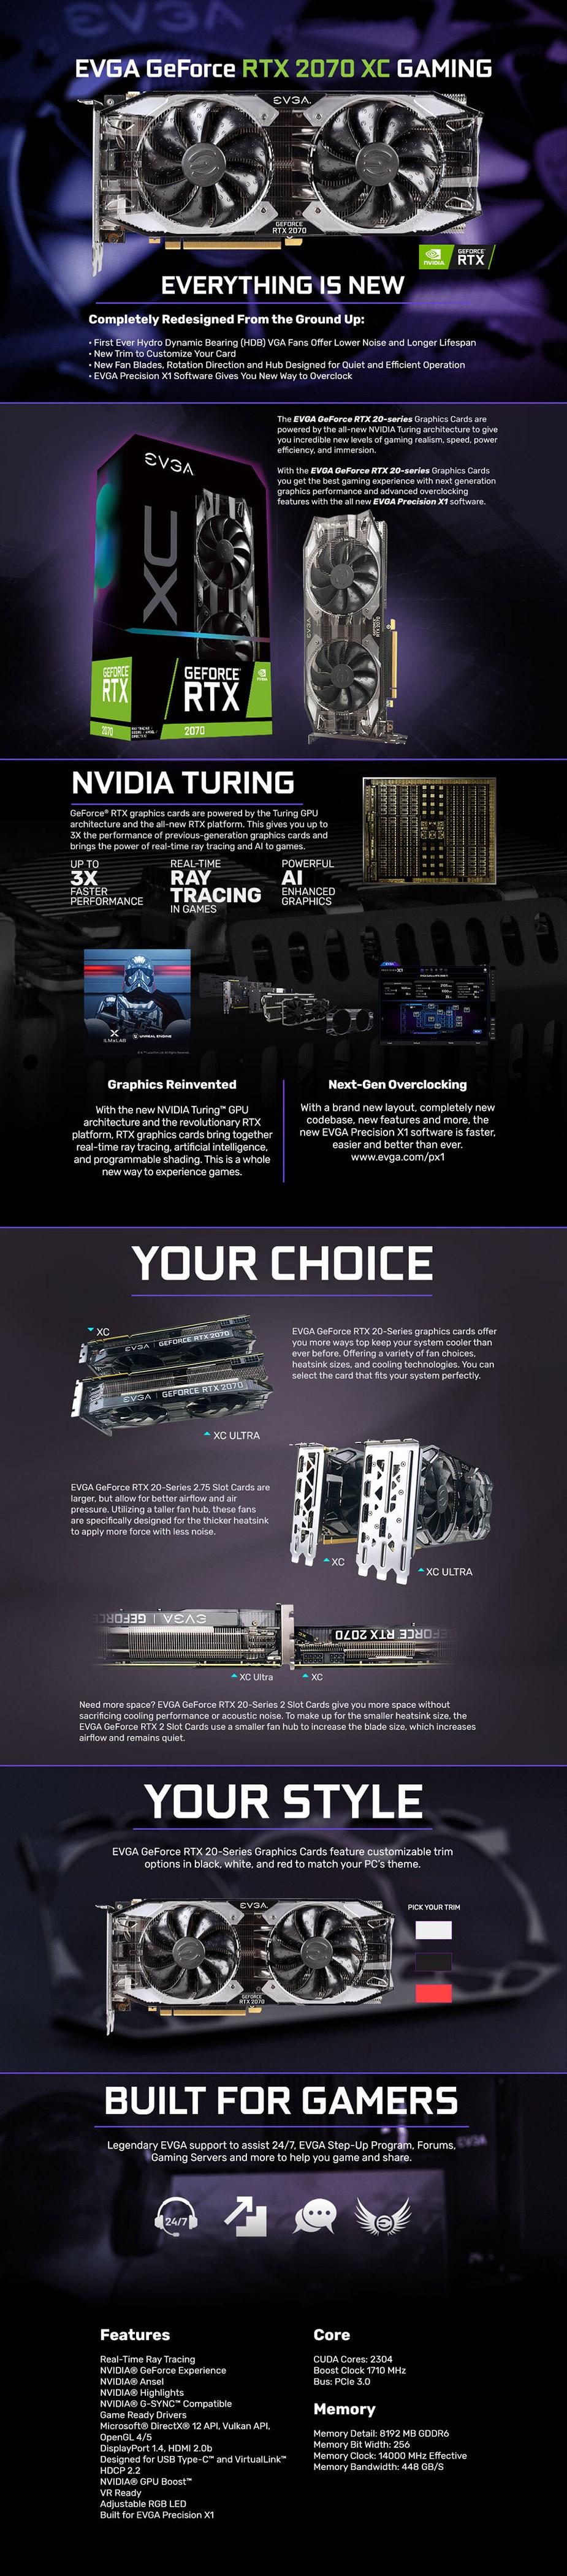 EVGA GeForce RTX 2070 XC GAMING 8GB Video Card - Desktop Overview 1